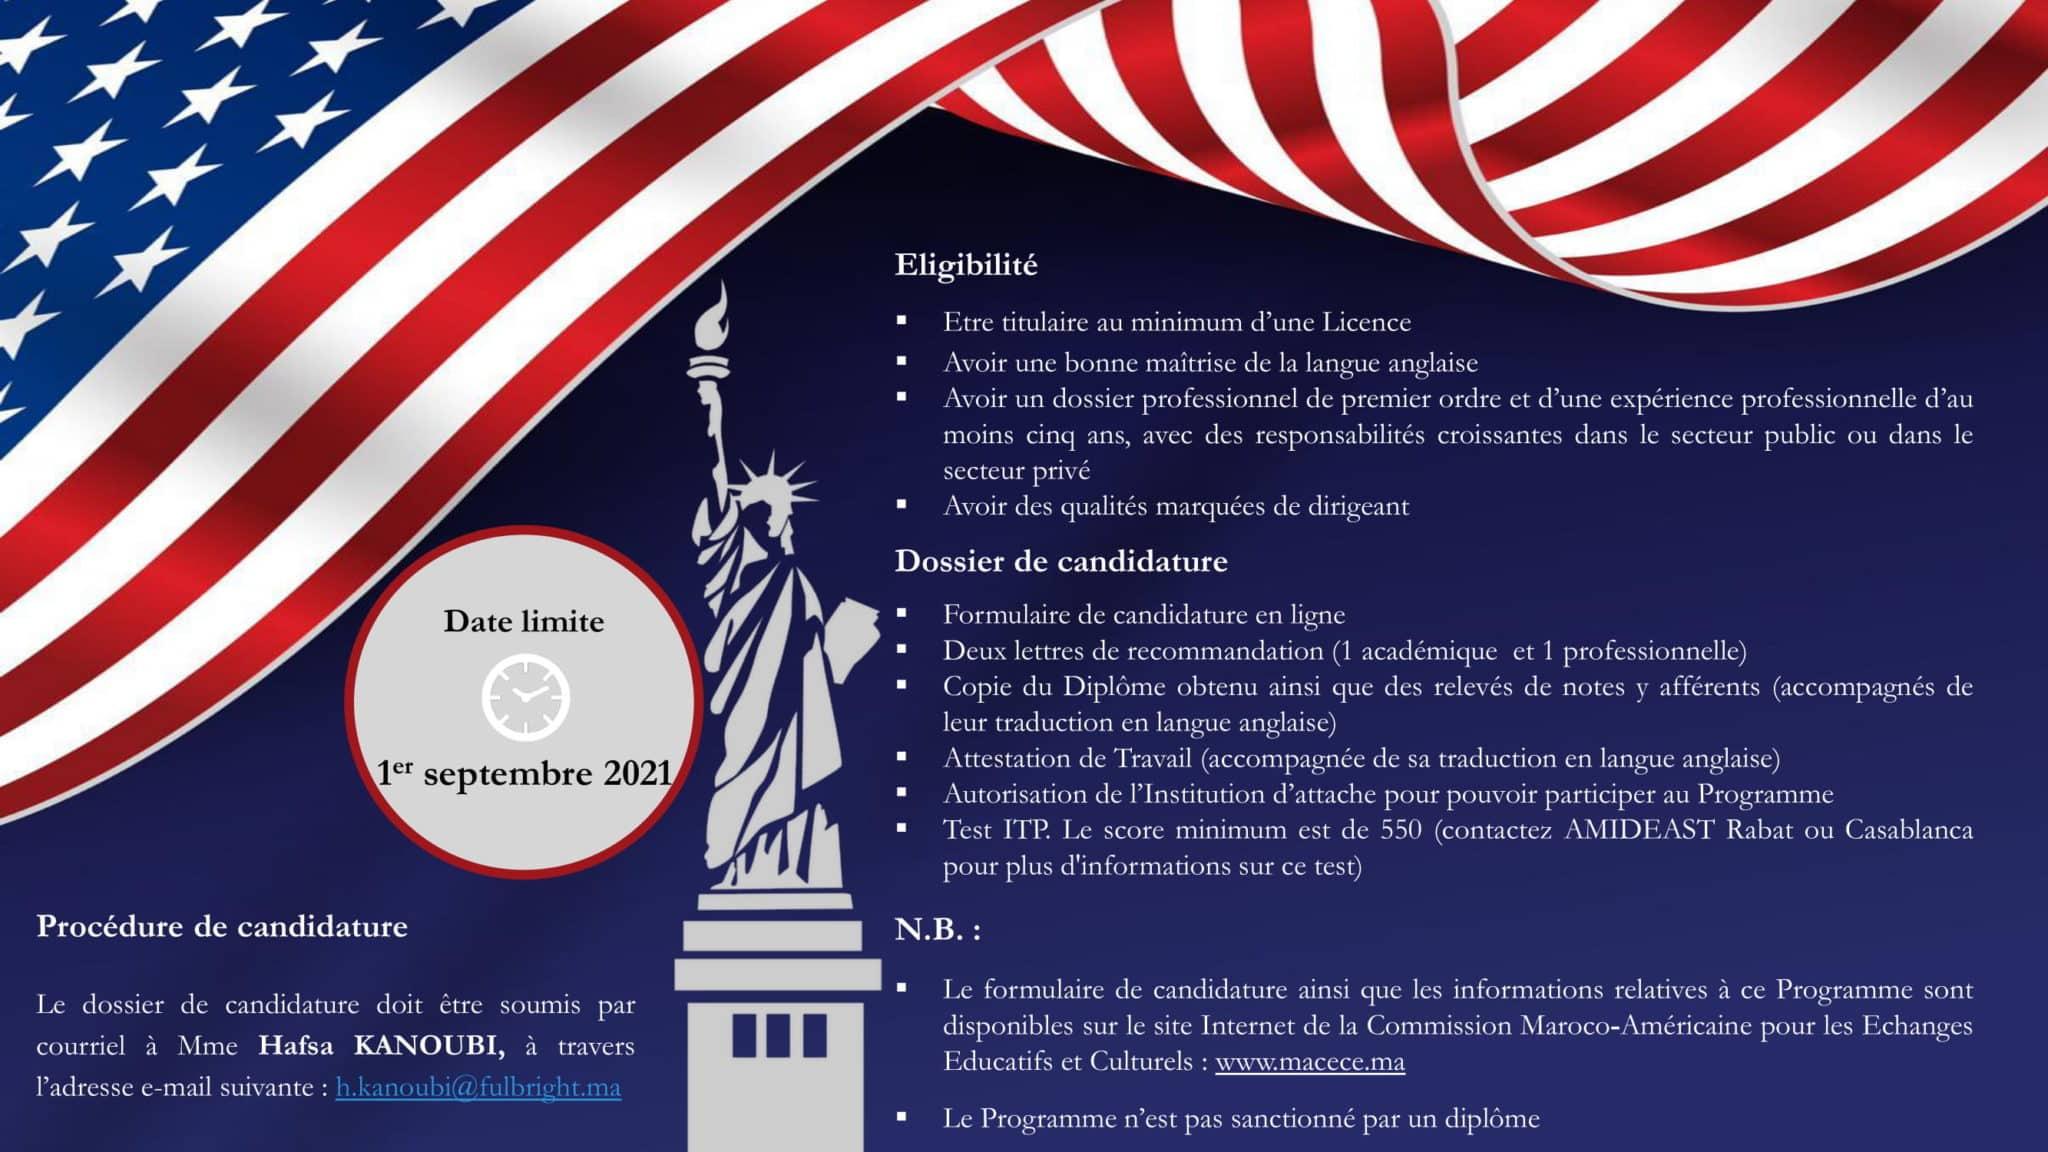 USA2 2 scaled The Hubert H. Humphrey Fellowship Program 2022/2023